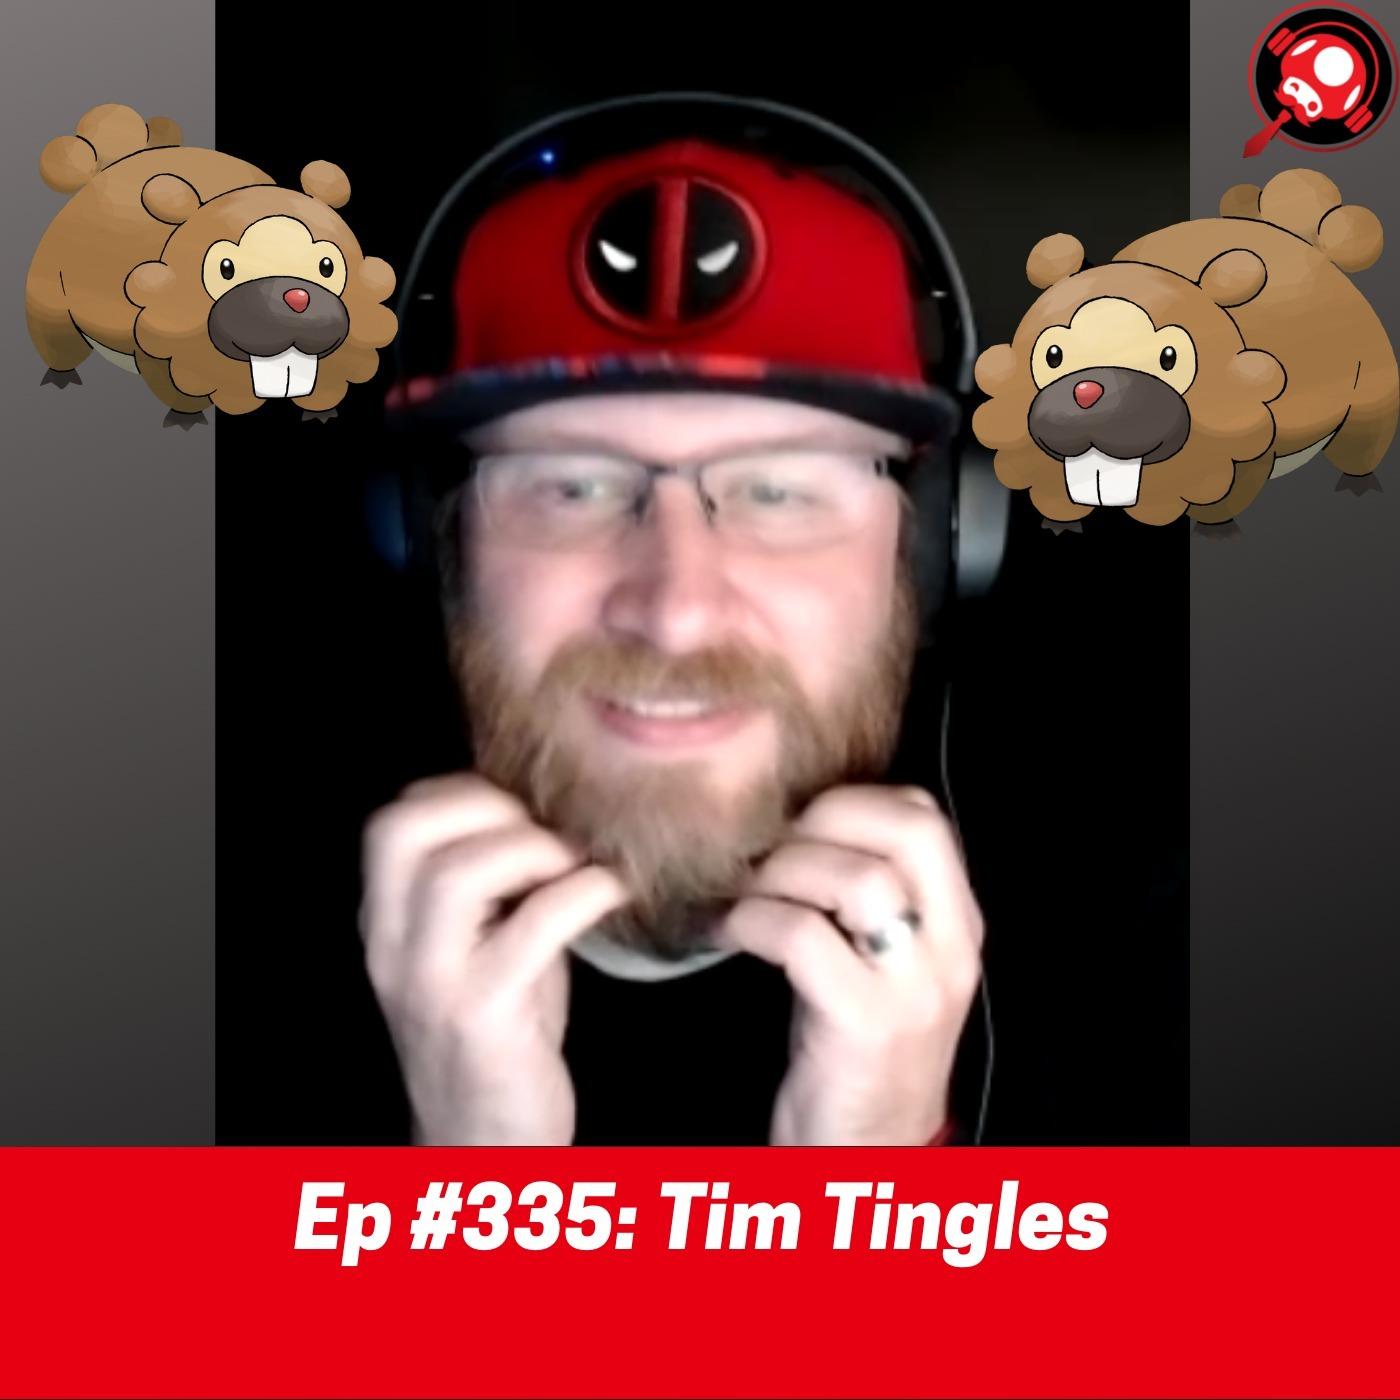 #335: Tim Tingles